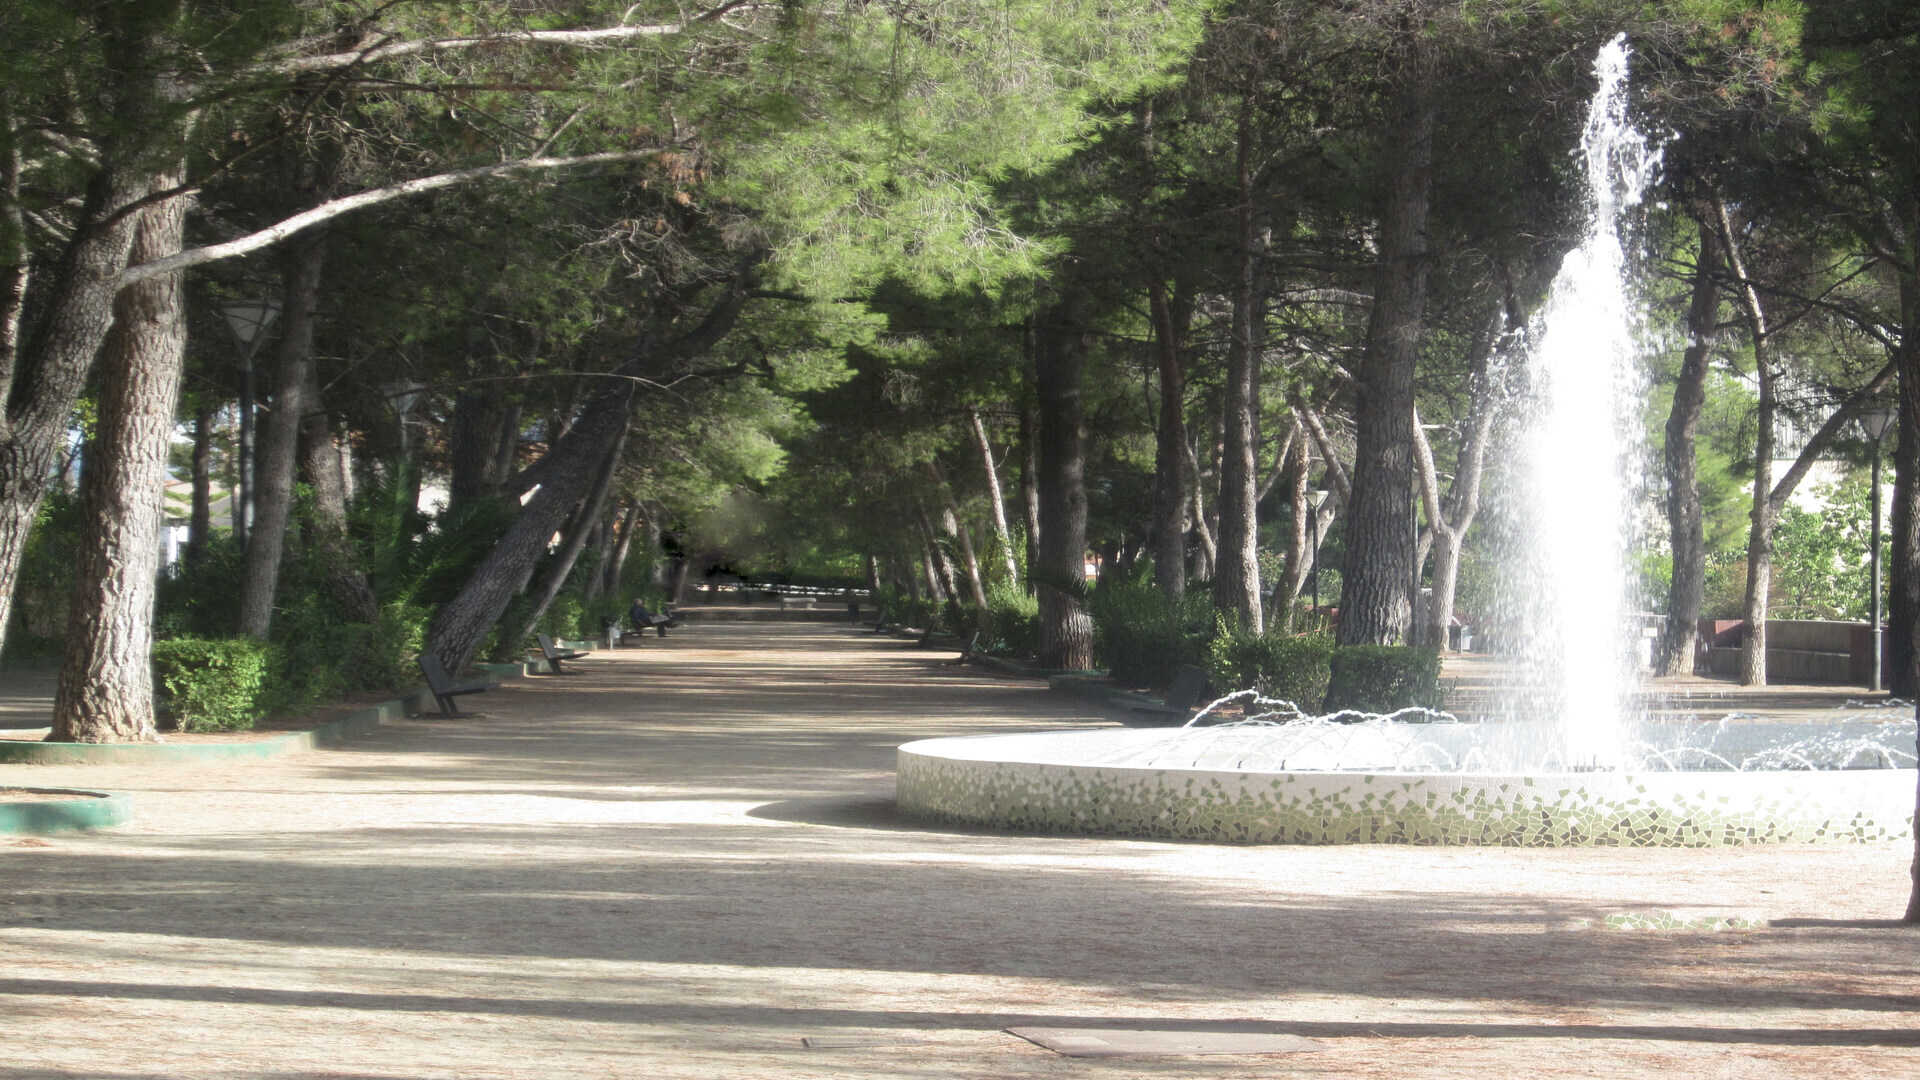 https://multimedia.comunitatvalenciana.com/118D6ACAD361469FA9253667C865BBDA/img/7221B09D2BD7461F892FAB99DDE4A4C8/parque-municipal-fuente-2red_mFWyYLoE.jpg?responsive